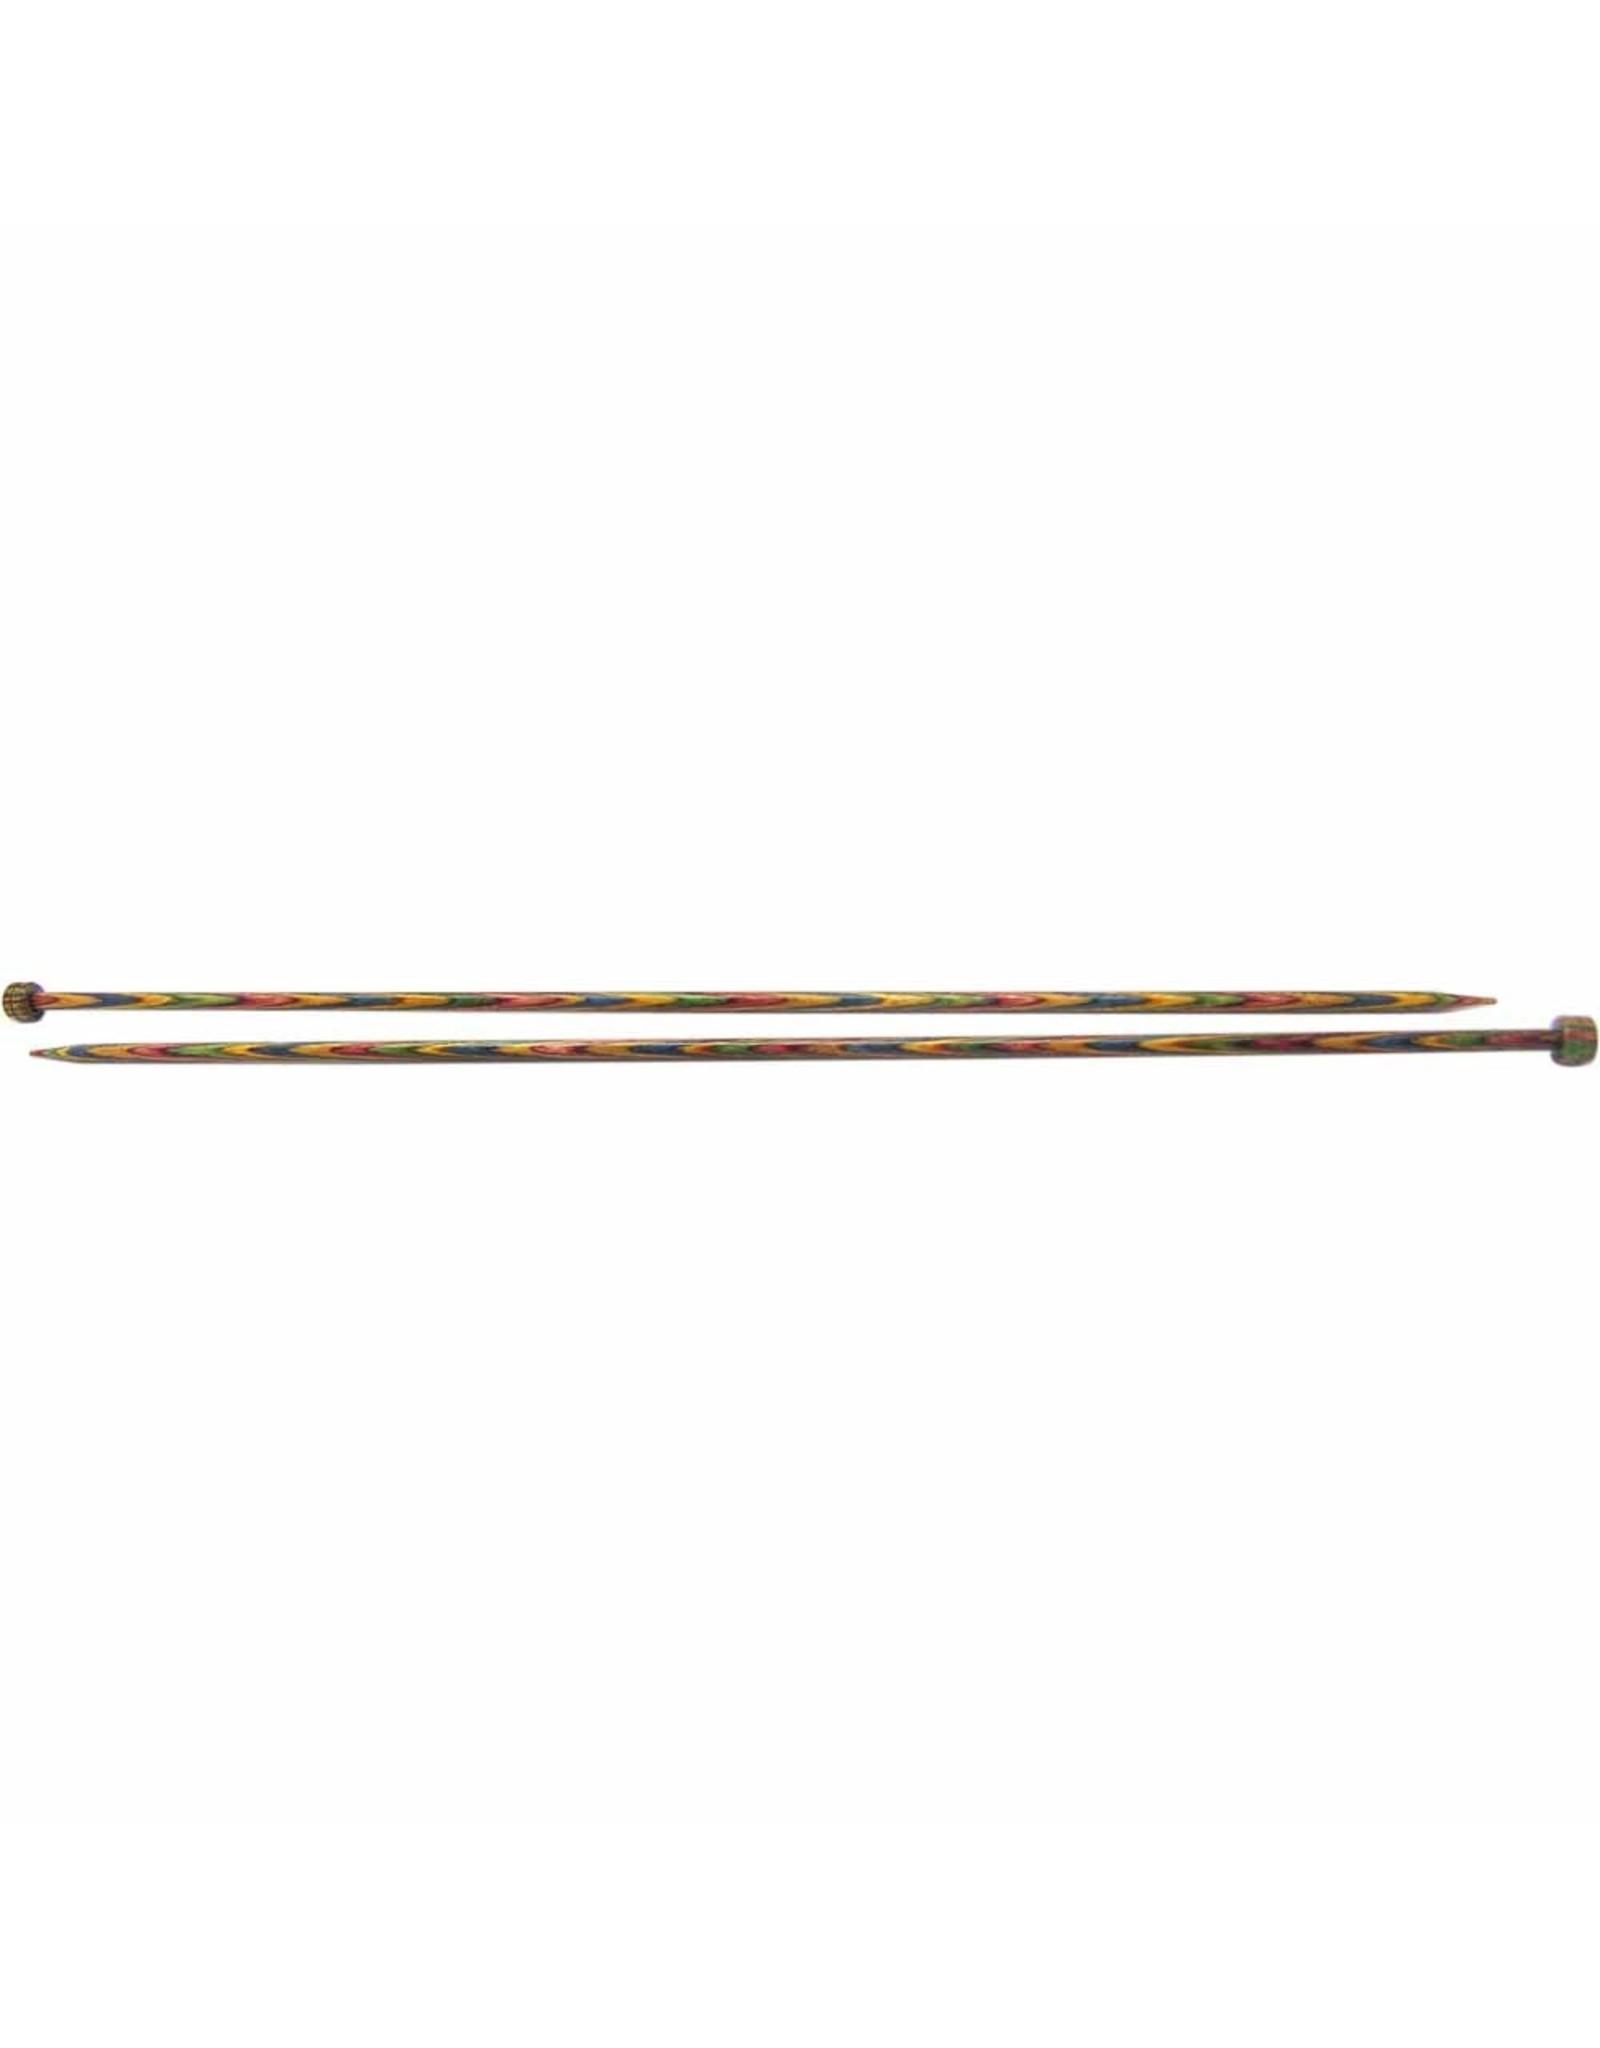 Knit Picks Knit Picks Rainbow Droites 14'' (35cm)